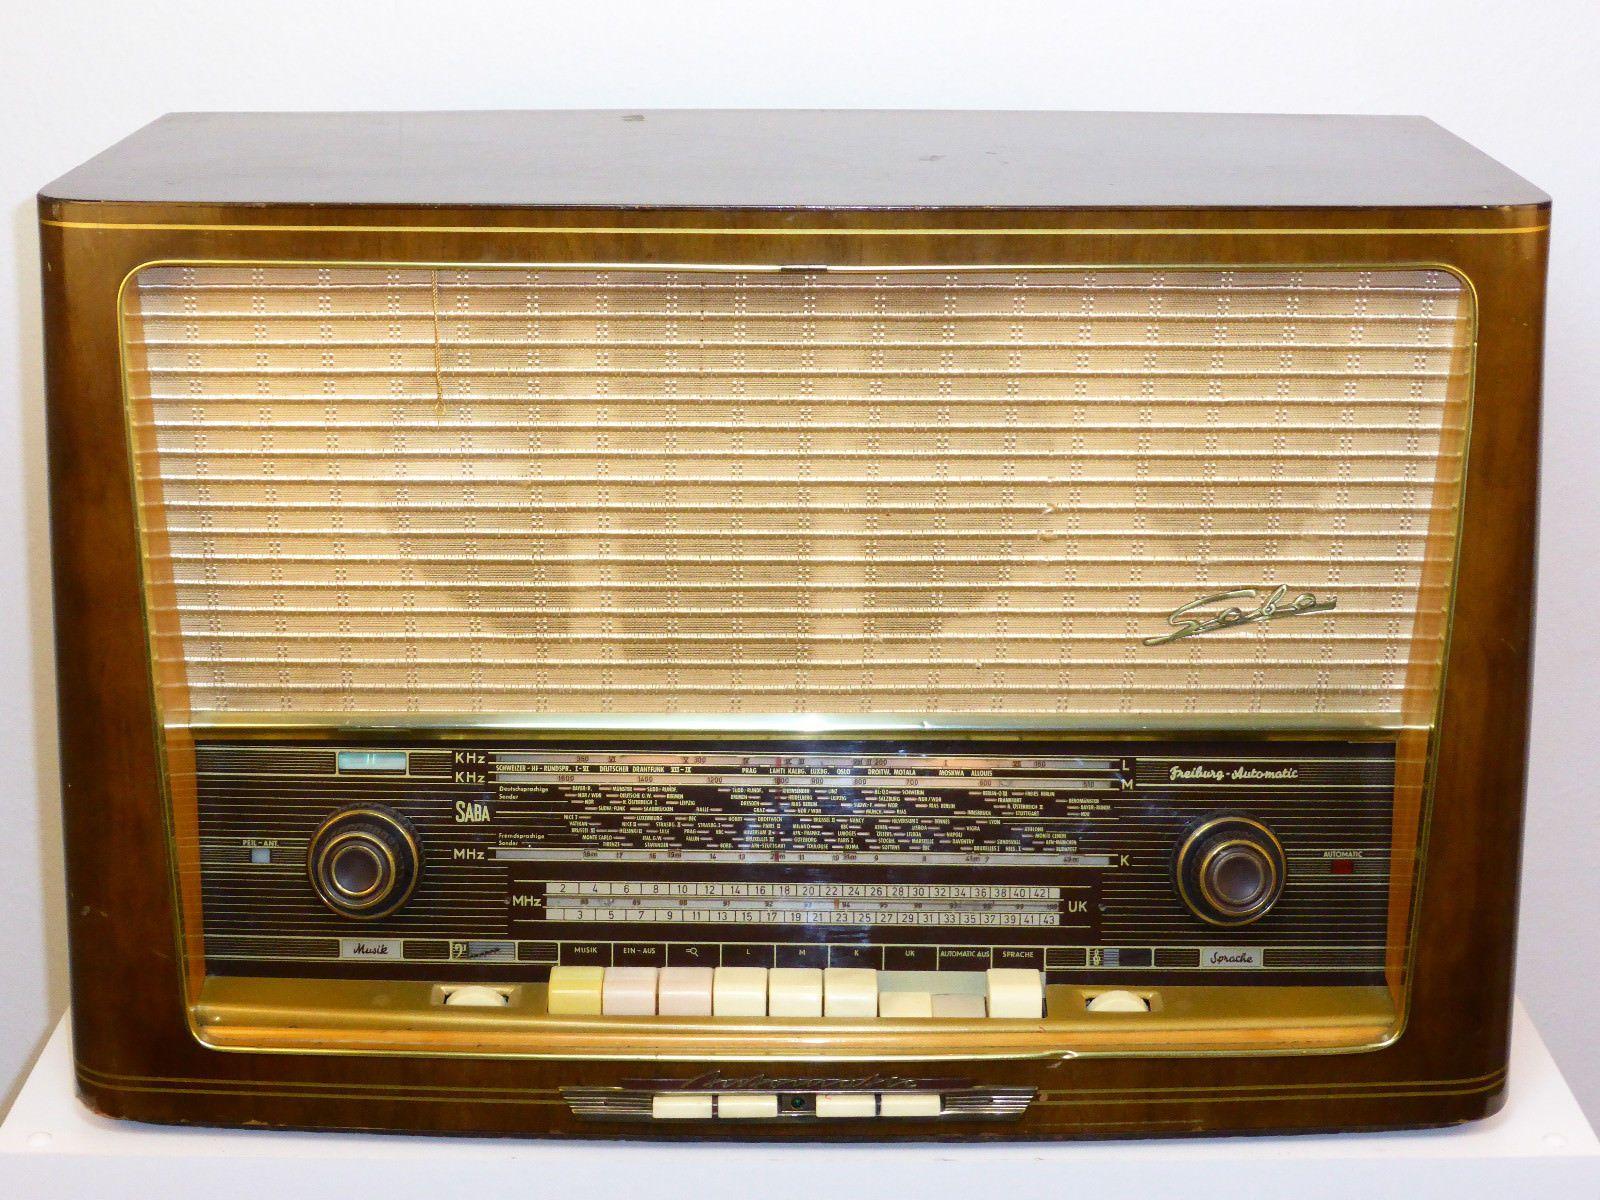 Rohrenradio Saba Freiburg Automatik 9 Tube Radio Ebay Antique Radio Radio Design Old Radios